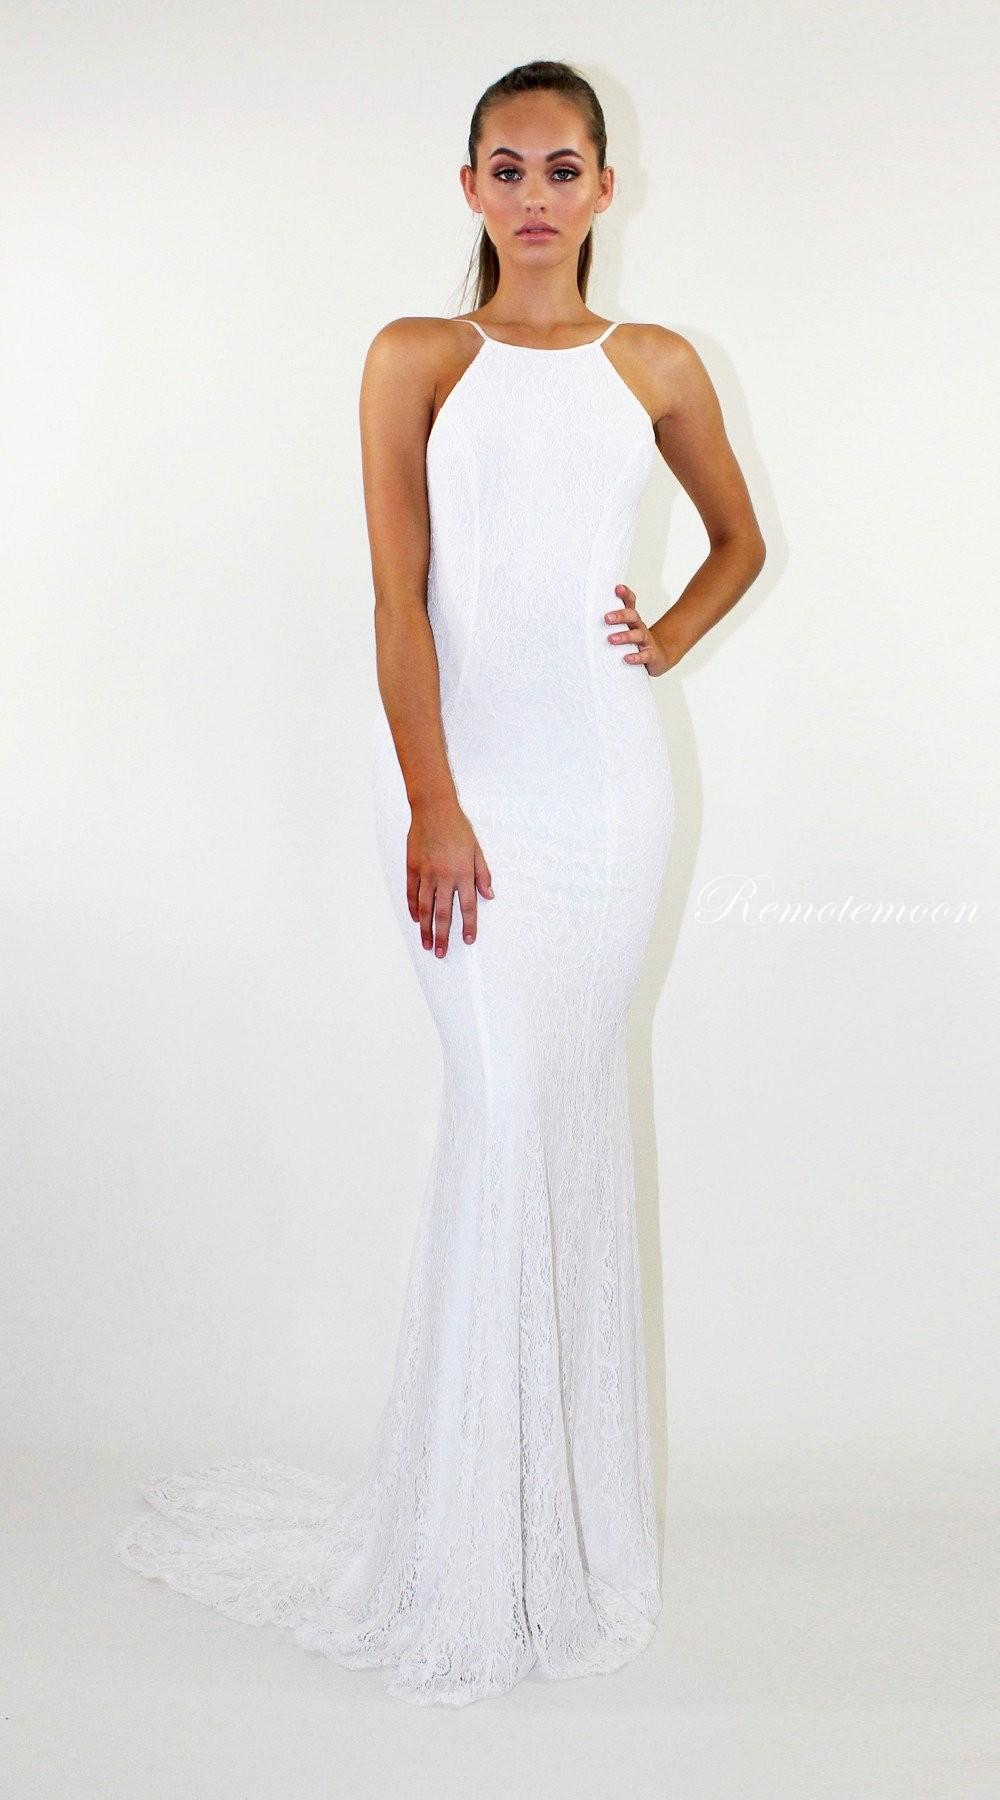 White Lace Backless Mermaid Wedding Dress Halter Neckline Low Cut Back Boho Beach Dresses 2018: White Lace Backless Wedding Dress At Reisefeber.org